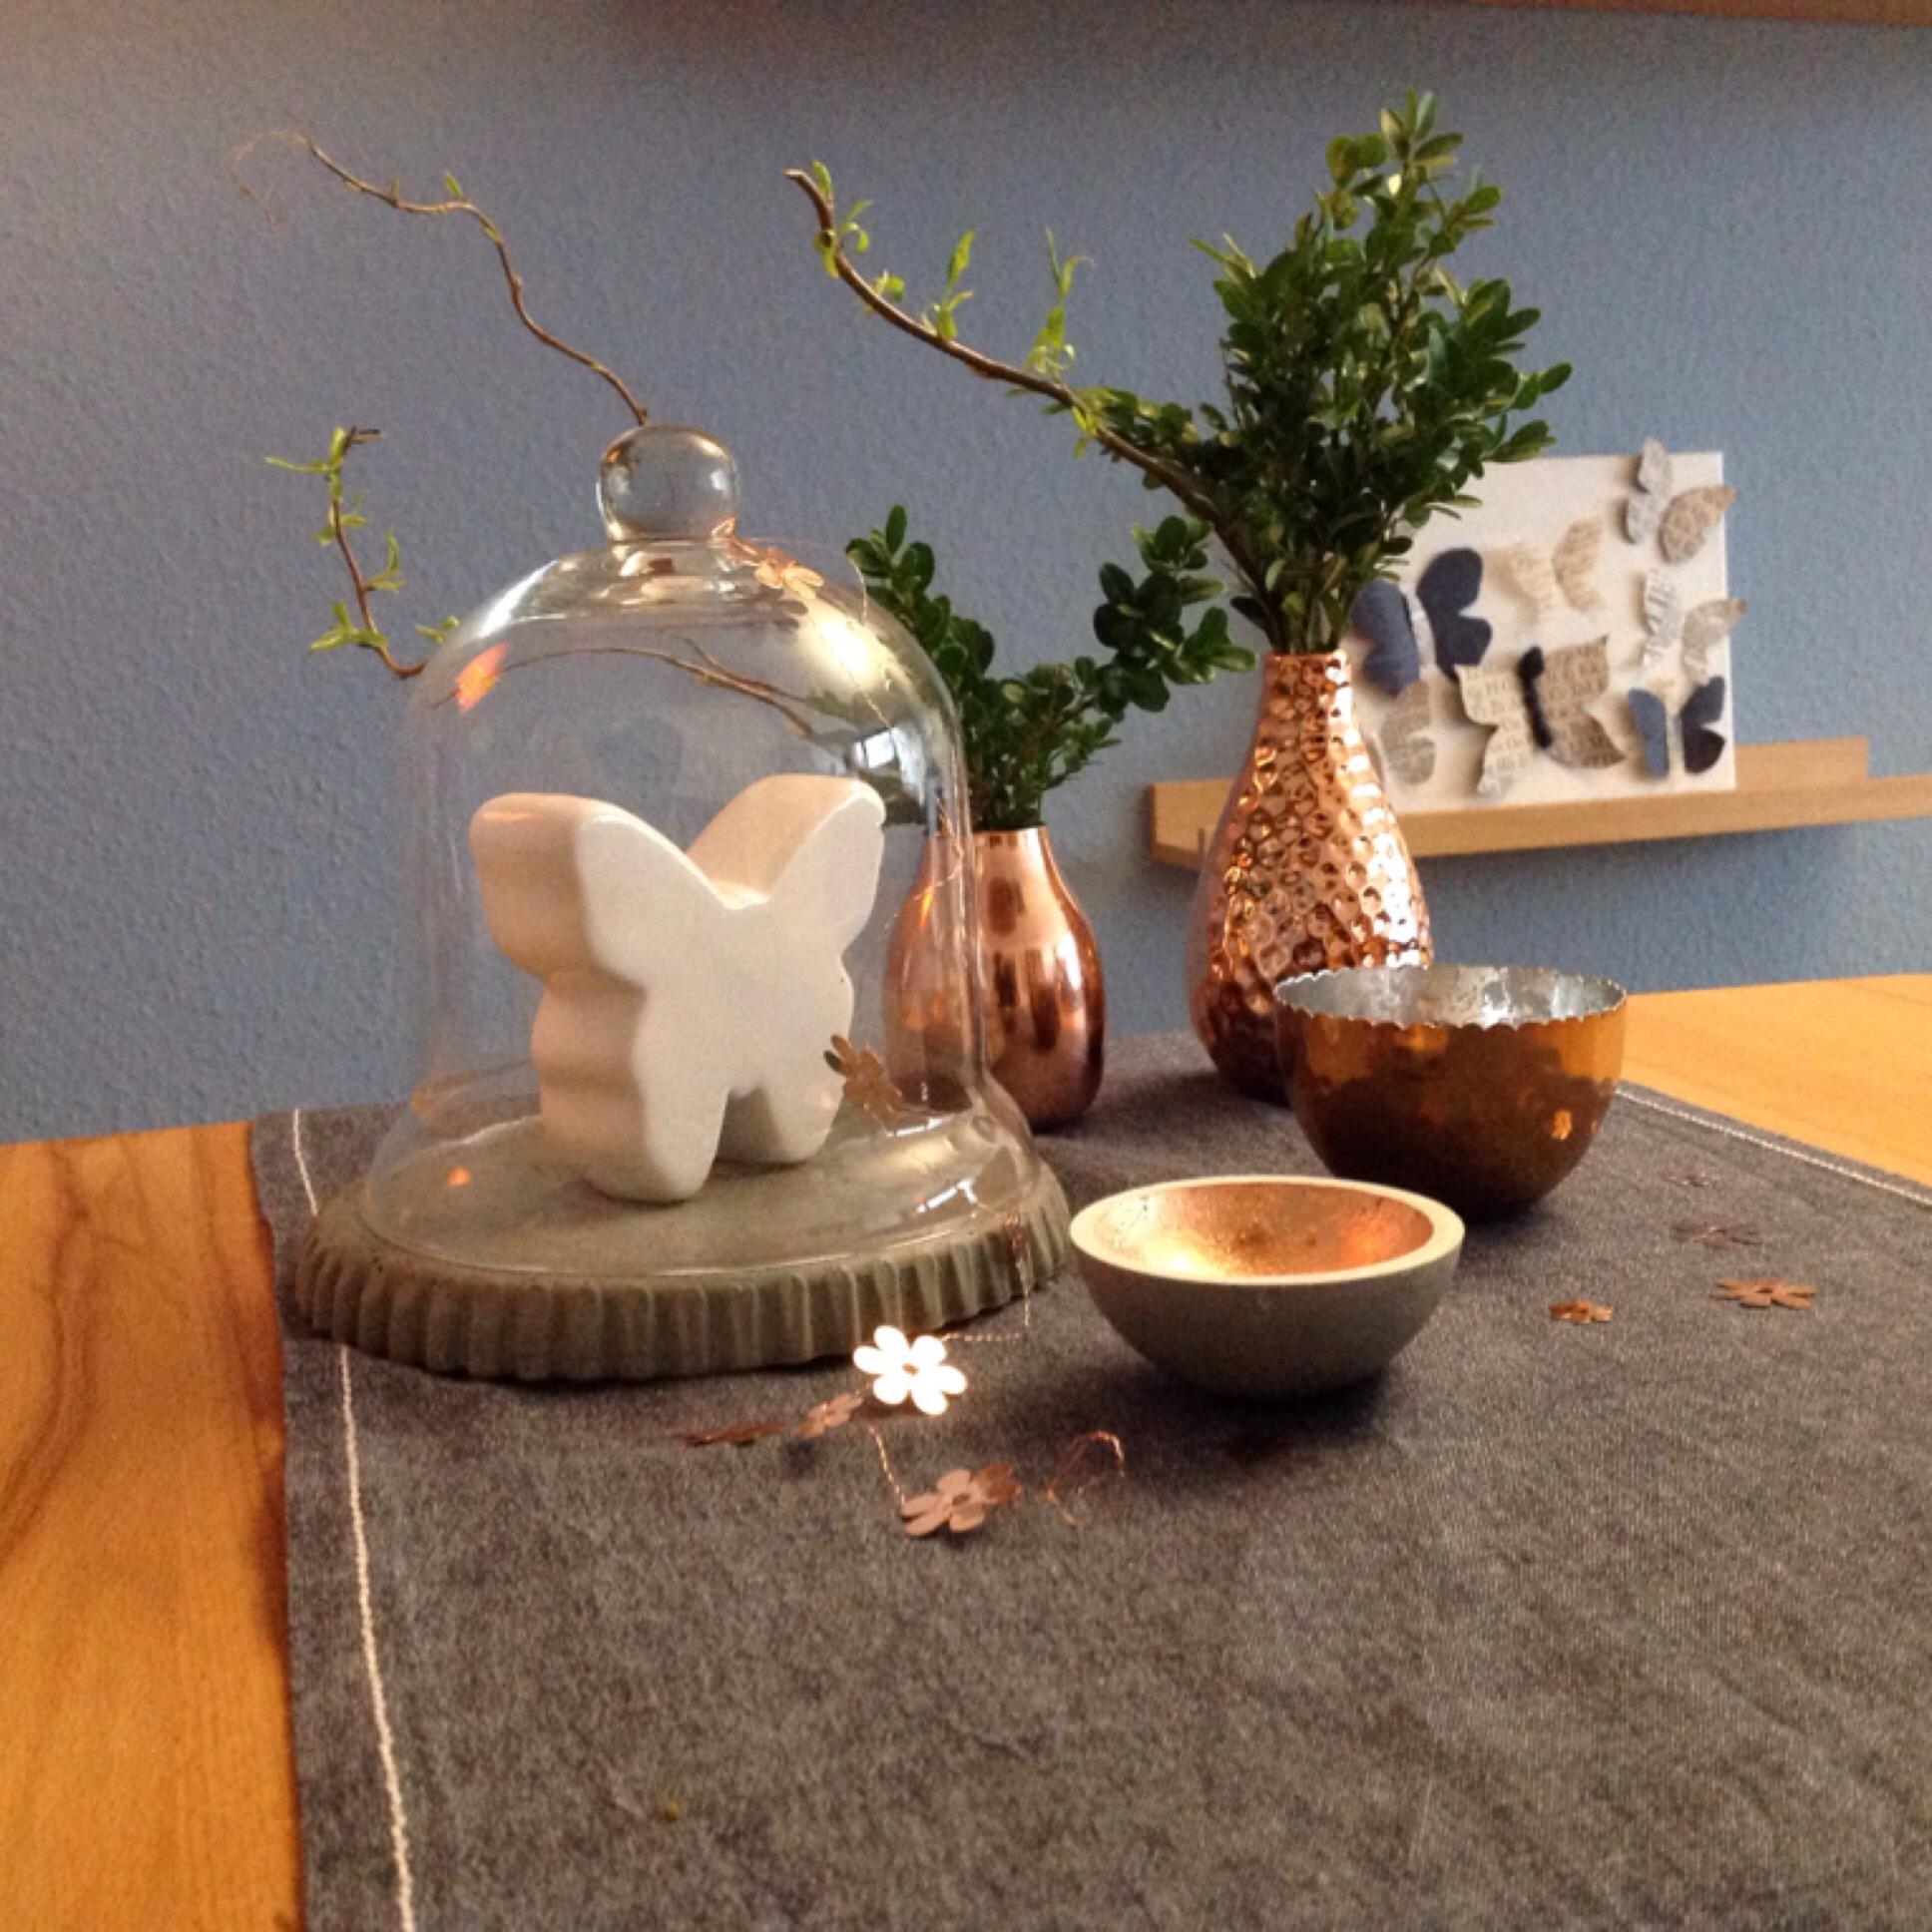 friday flowerday oder es gr nt so gr n buchszweige. Black Bedroom Furniture Sets. Home Design Ideas